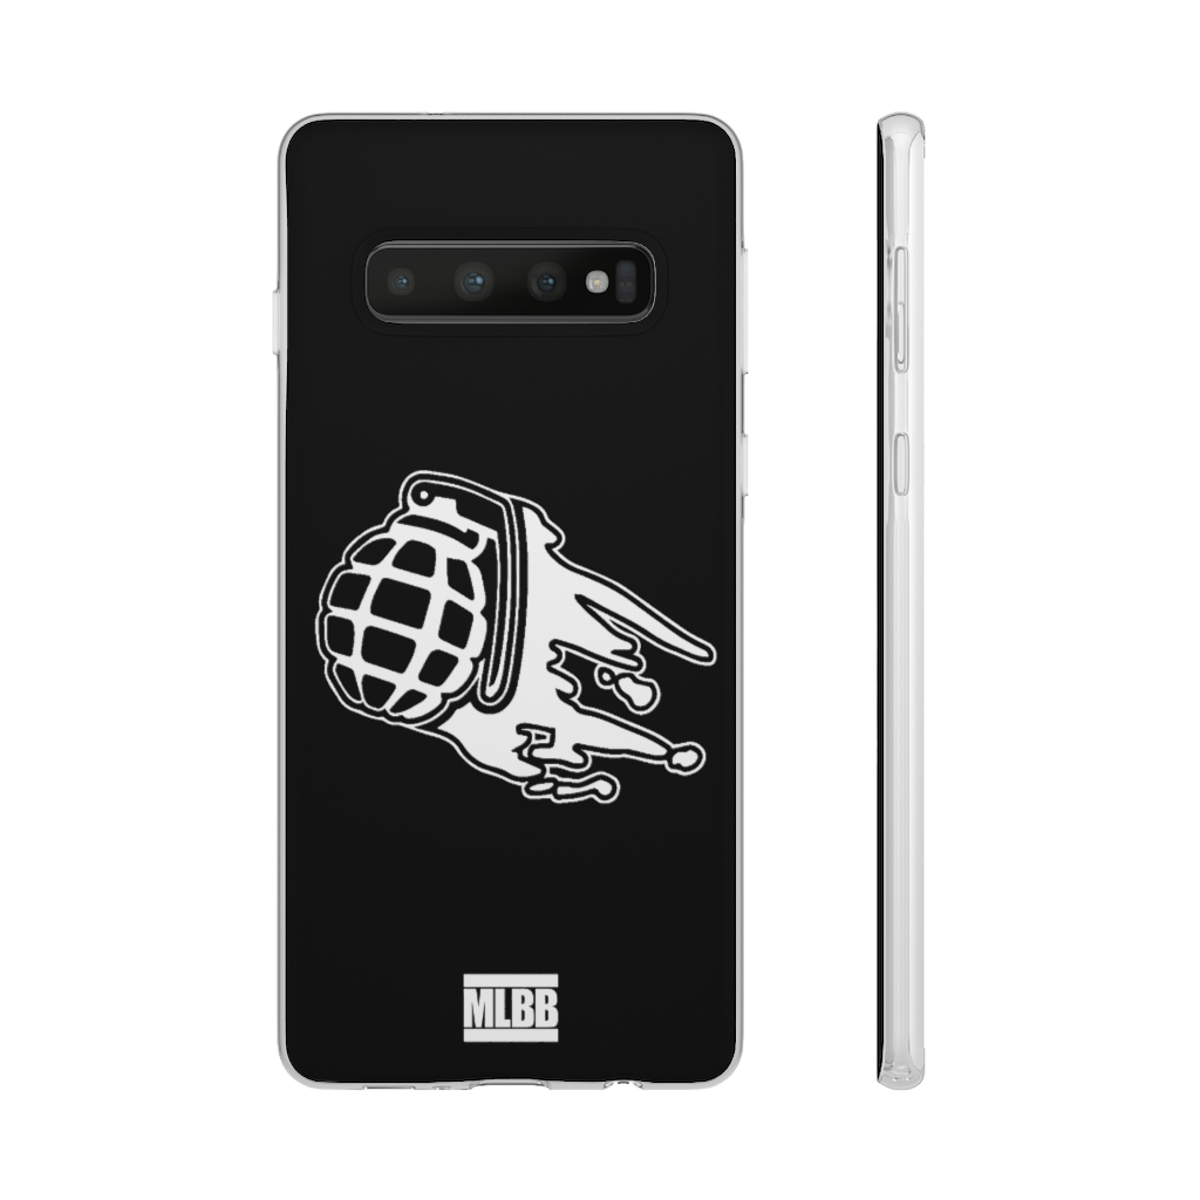 MLBB Grenade Flexi Cases - Black